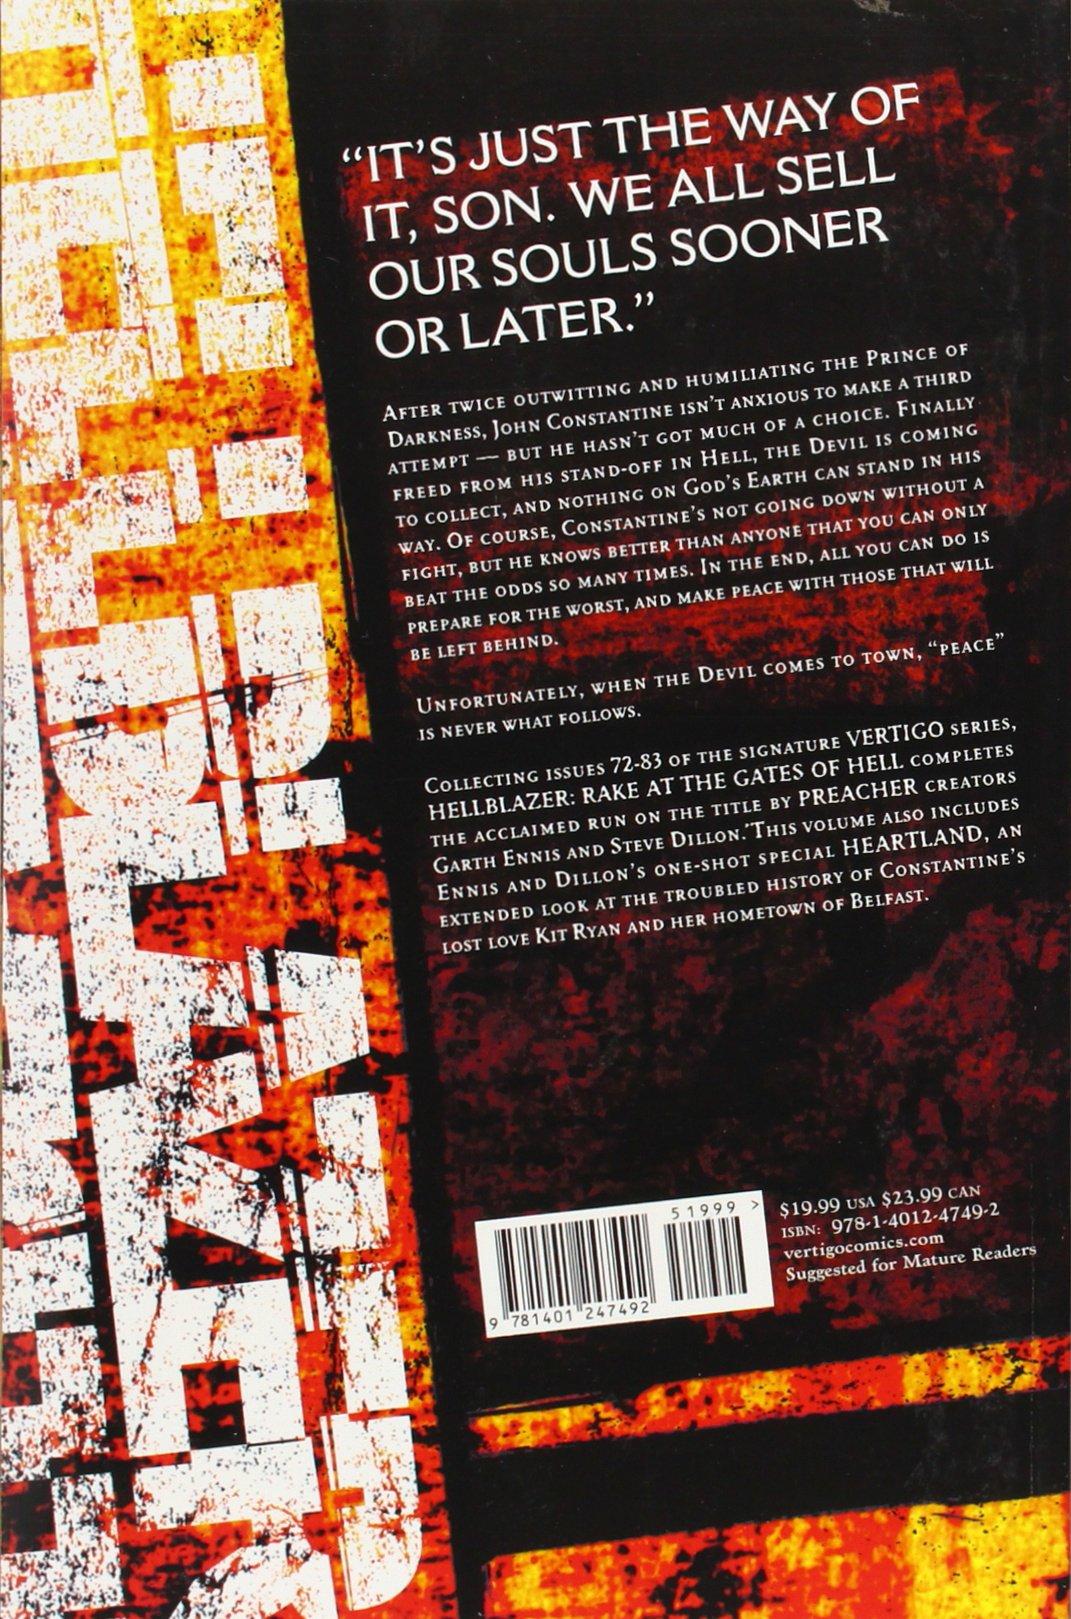 8: Rake at the Gates of Hell: Garth Ennis, Steve Dillon: 9781401247492: Amazon.com: Books